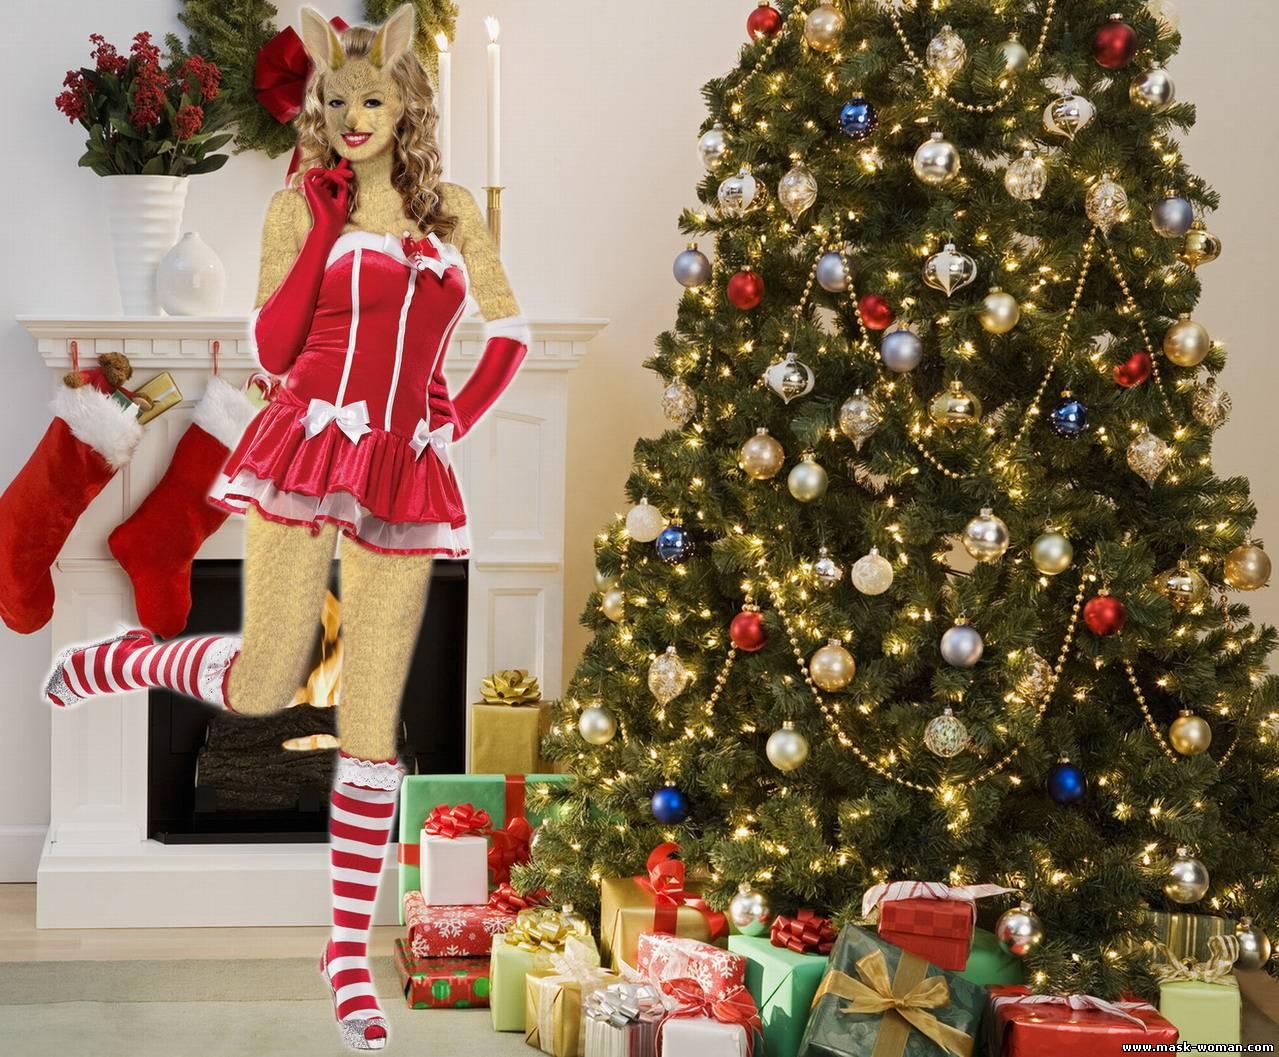 Фото новогодней елки 2012 воронеж 5